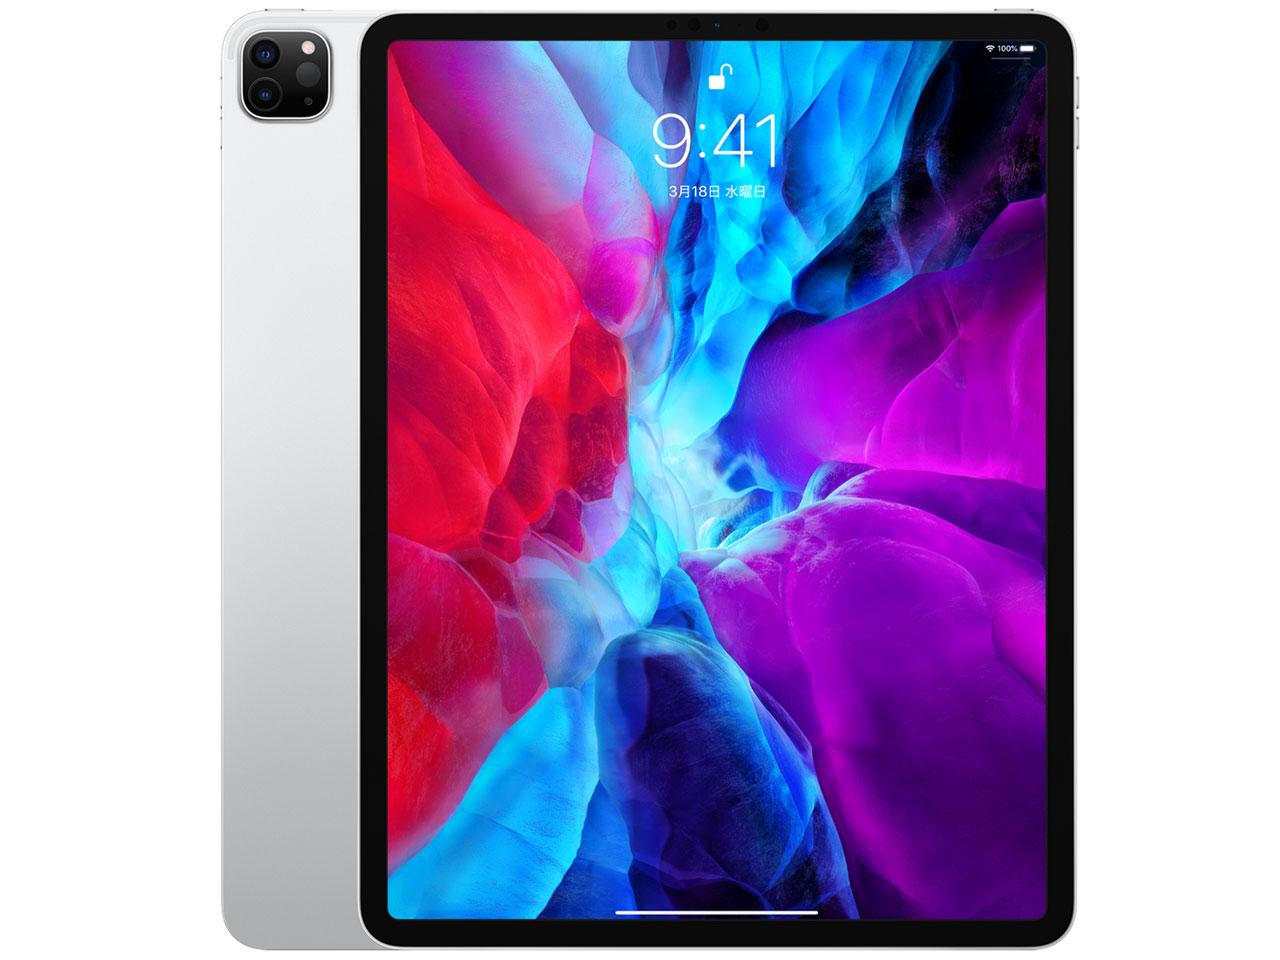 Apple iPad Pro 12.9インチ 256GB MXAU2J/A [シルバー]【お取り寄せ(メーカー取り寄せ/予約受付中)】※2ヶ月以上